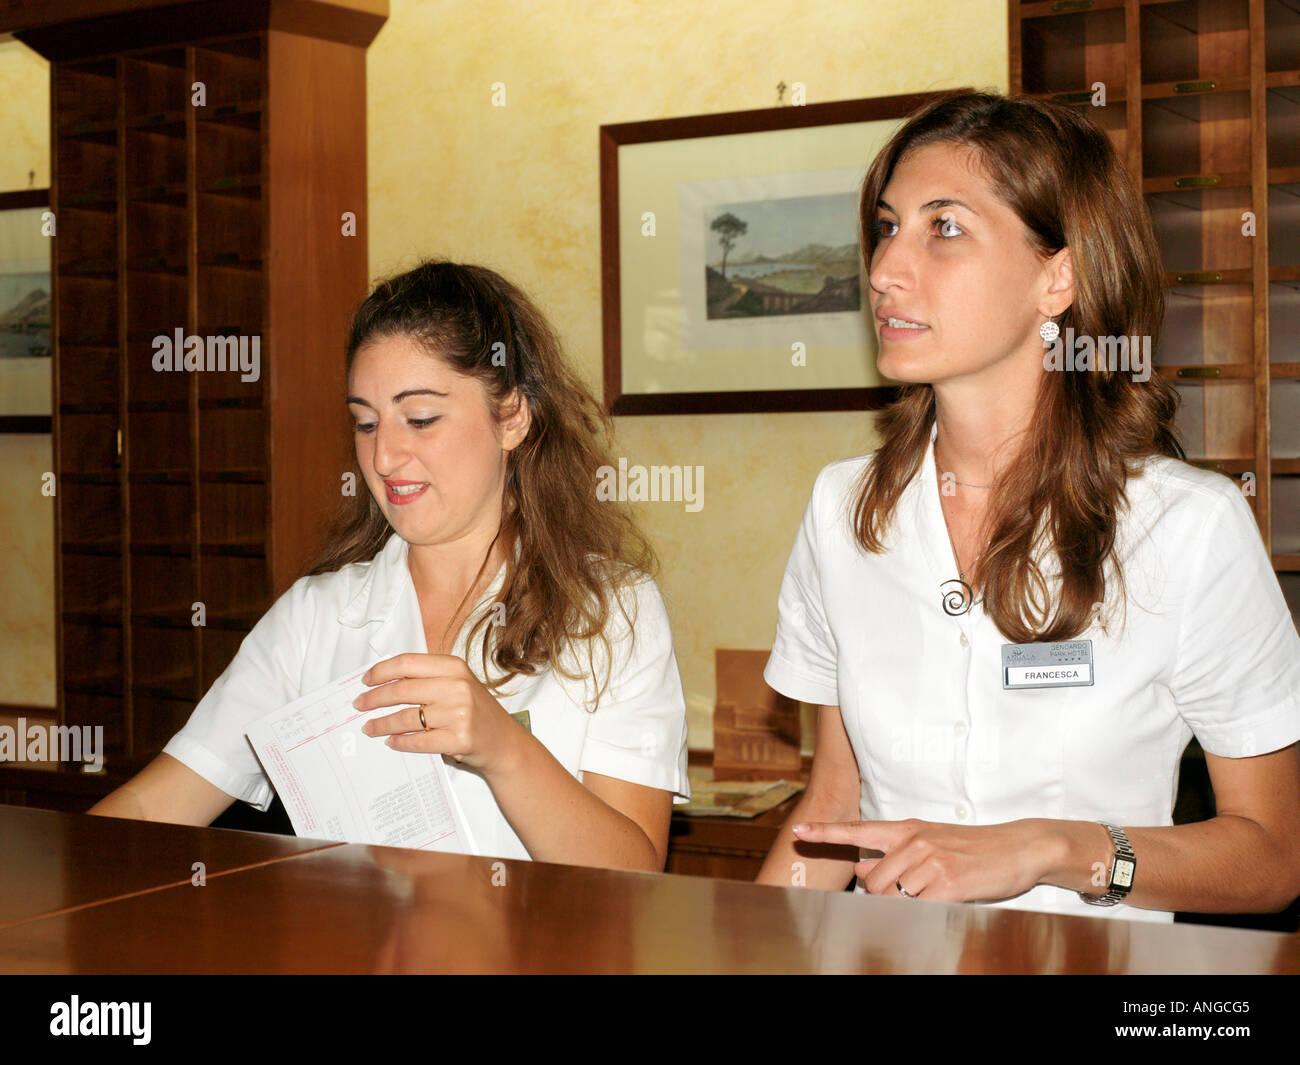 Palermo Sicily Italy Genoardo Park Hotel Receptionists - Stock Image